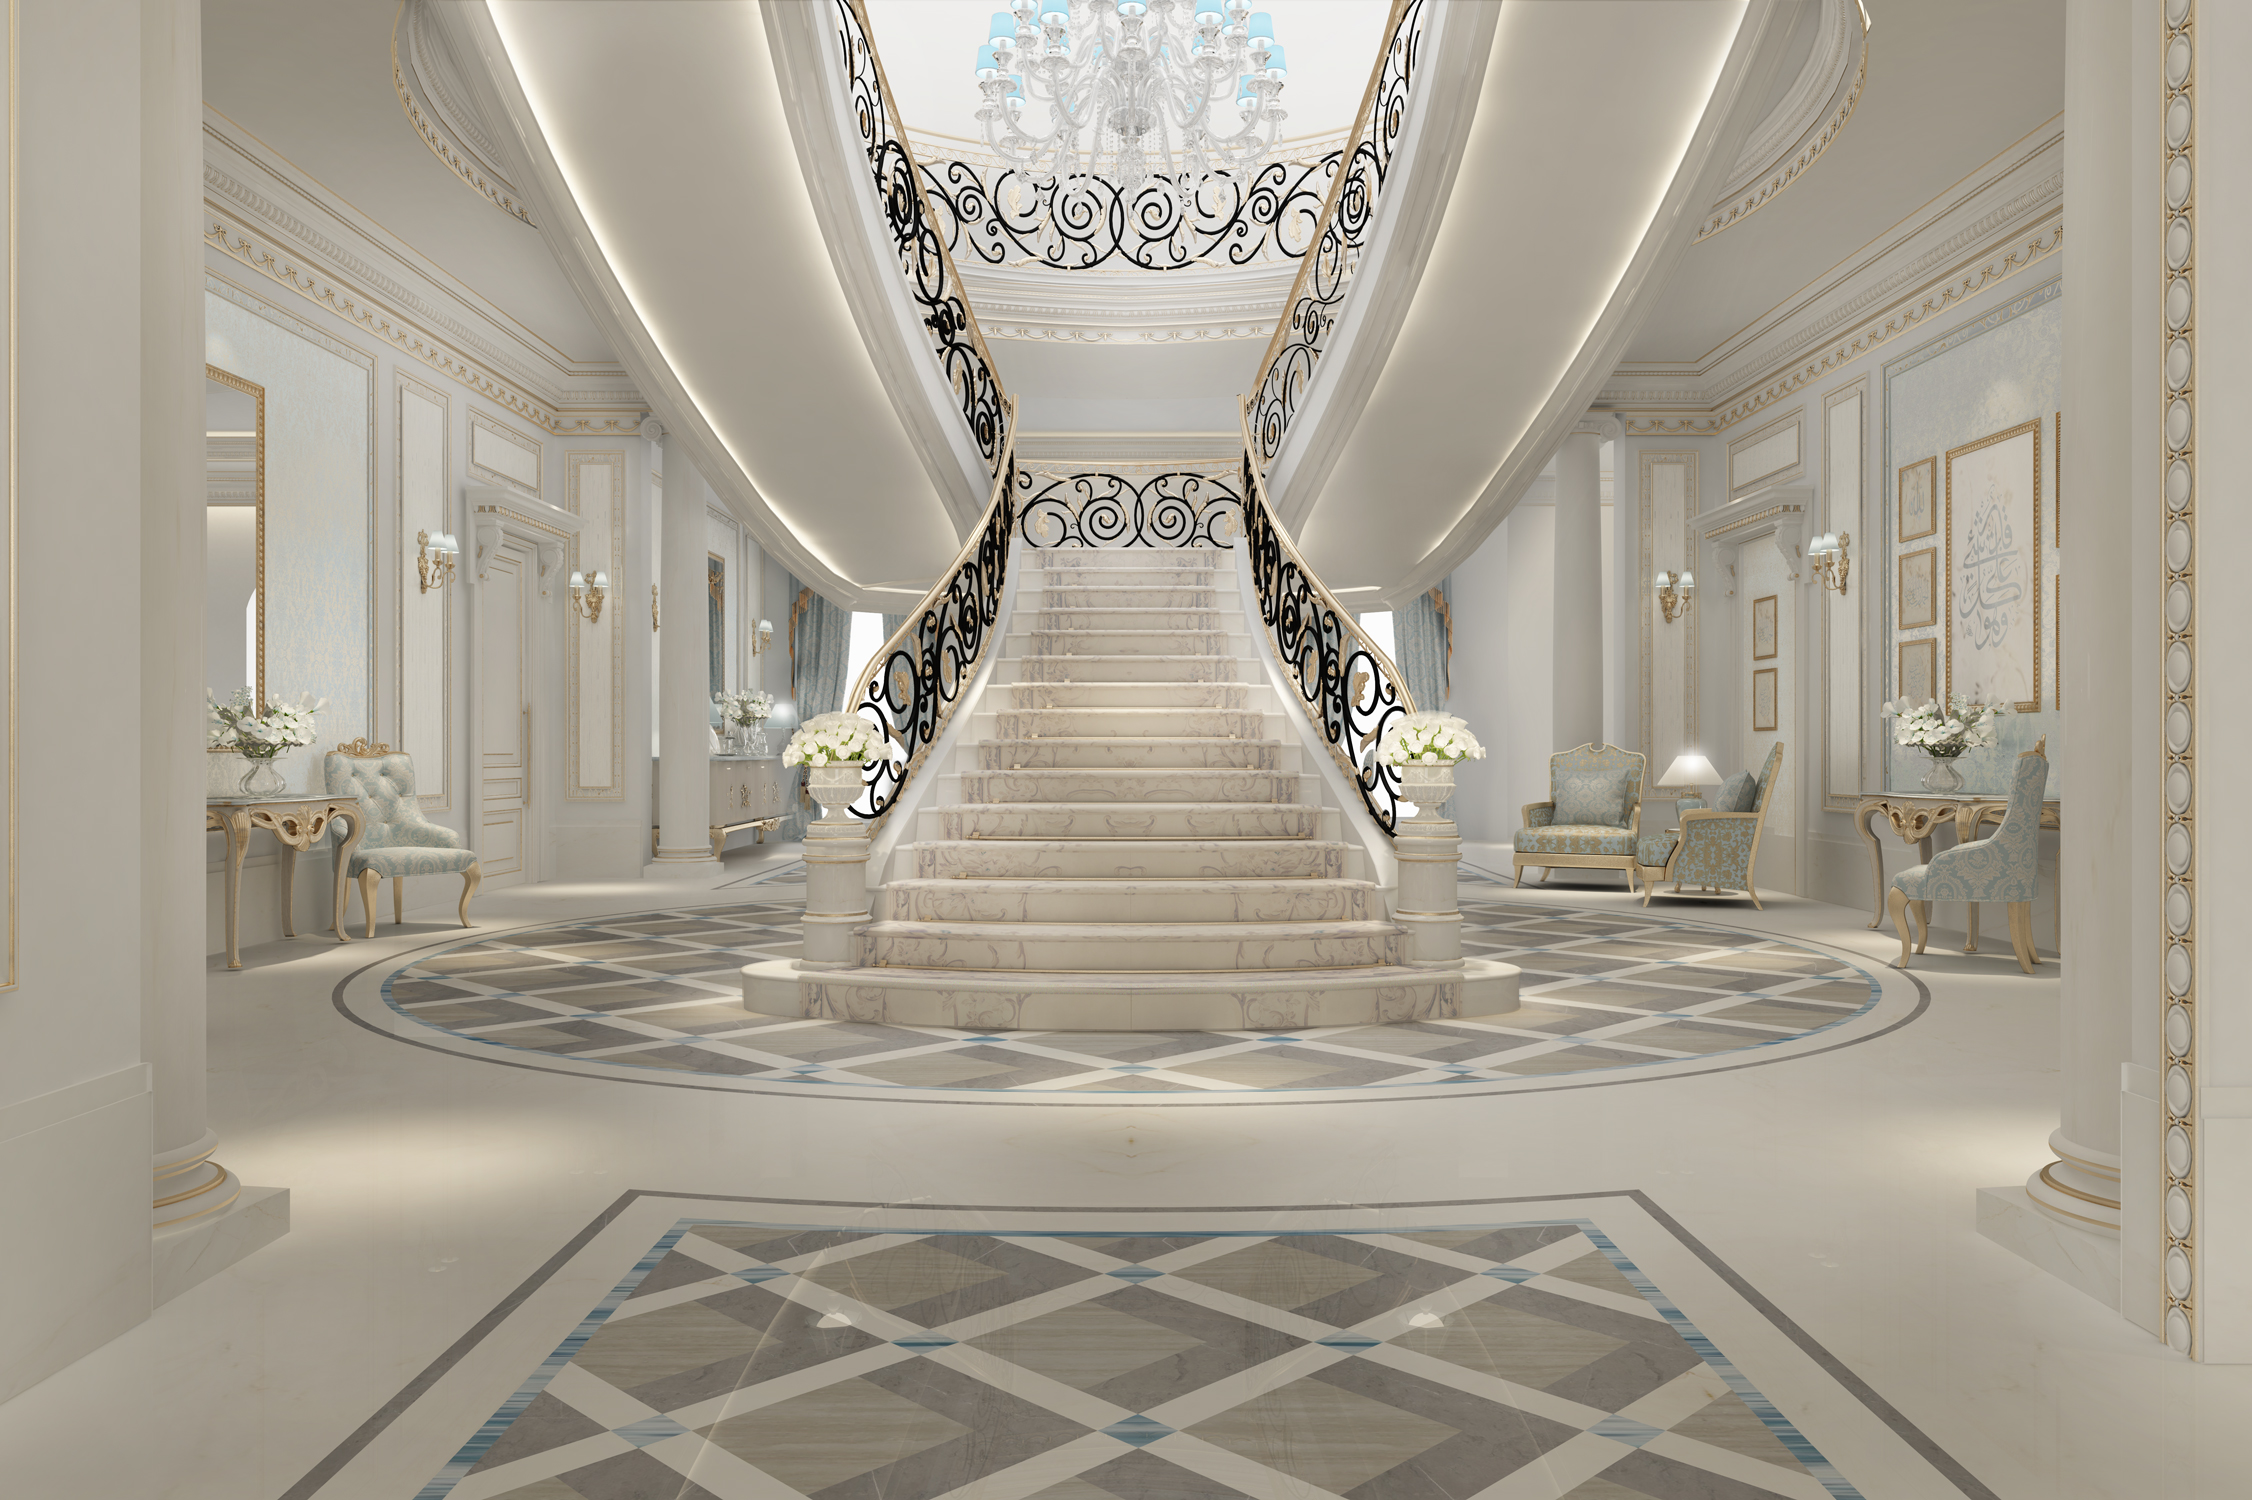 Villa Design - Entrance Lobby Ideas